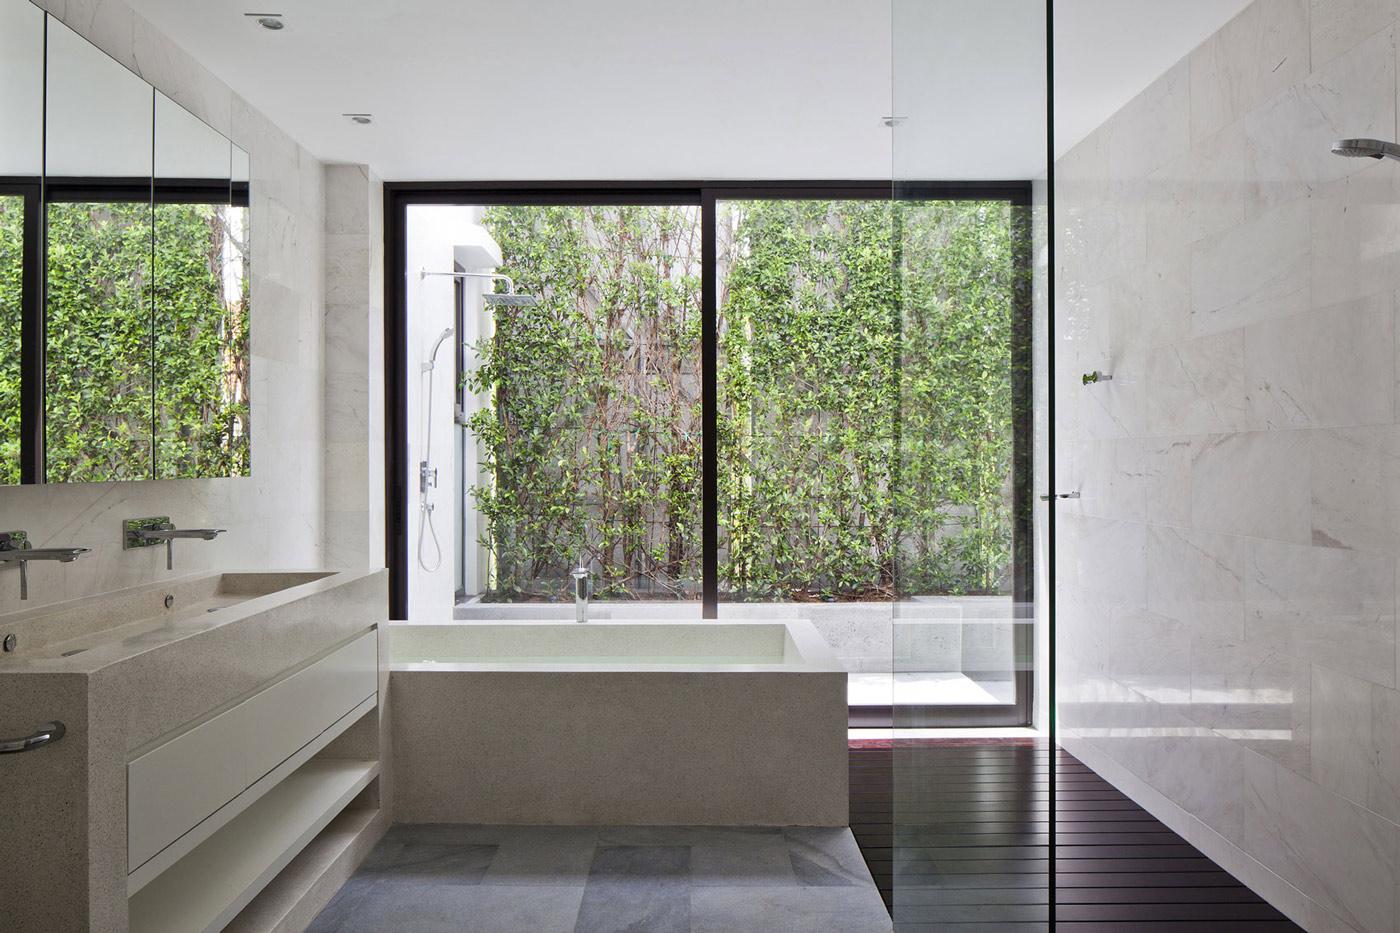 Glass Screen, Shower, Bath, Sinks, Marble Tiles